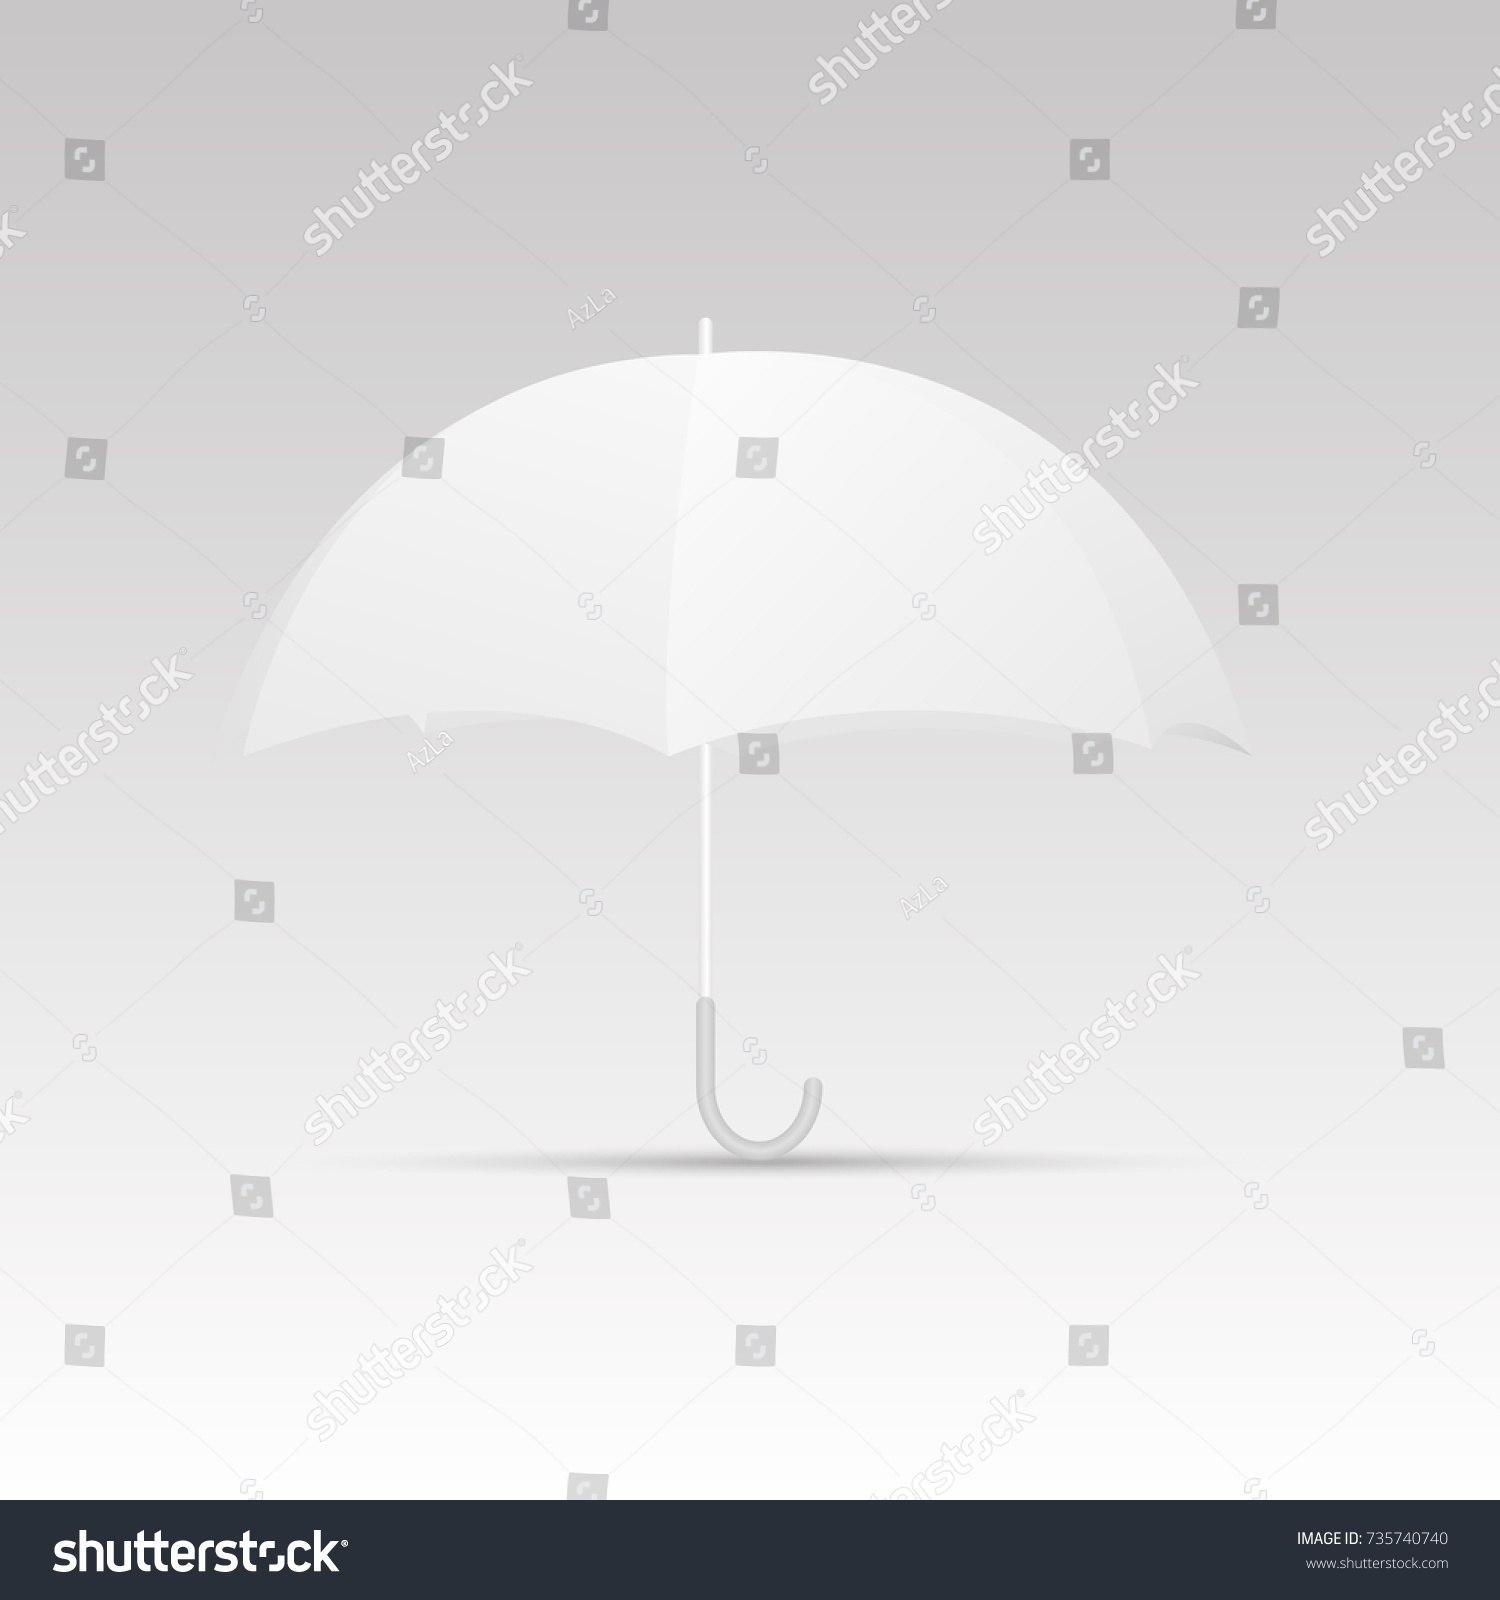 White Umbrella Blank Template Vector Stock Vector Royalty Free In Blank Umbrella Template